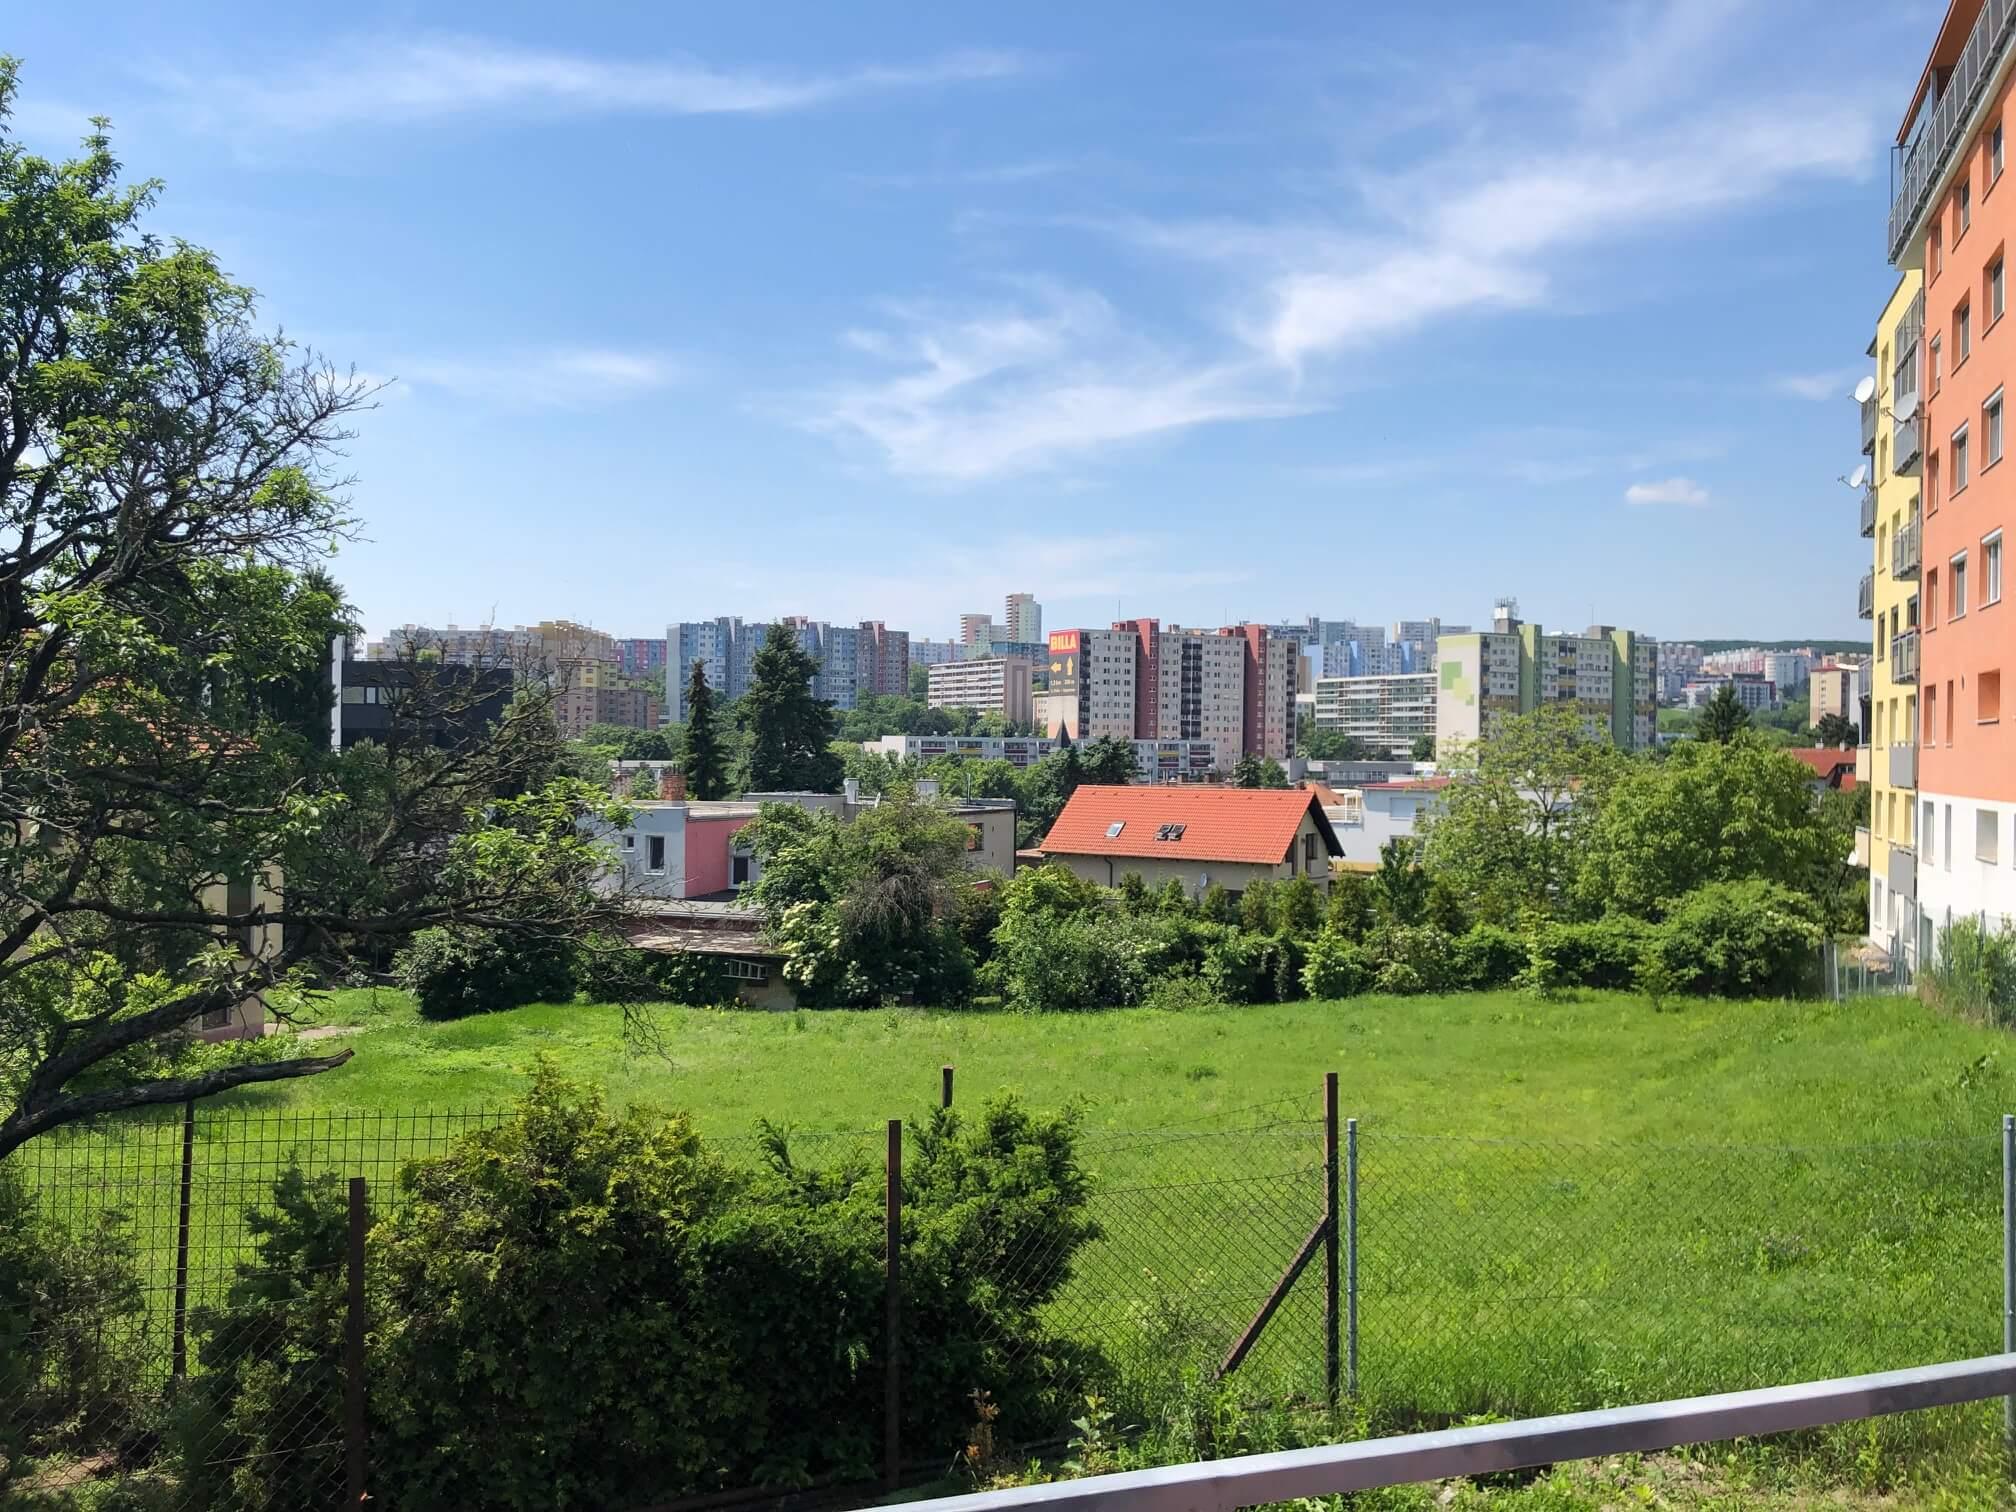 Rezervované: 3 izbový byt, novostavba, 72,25m2, loggia 4,82m2, Staré Grunty, Karlovka, garážové státie-51